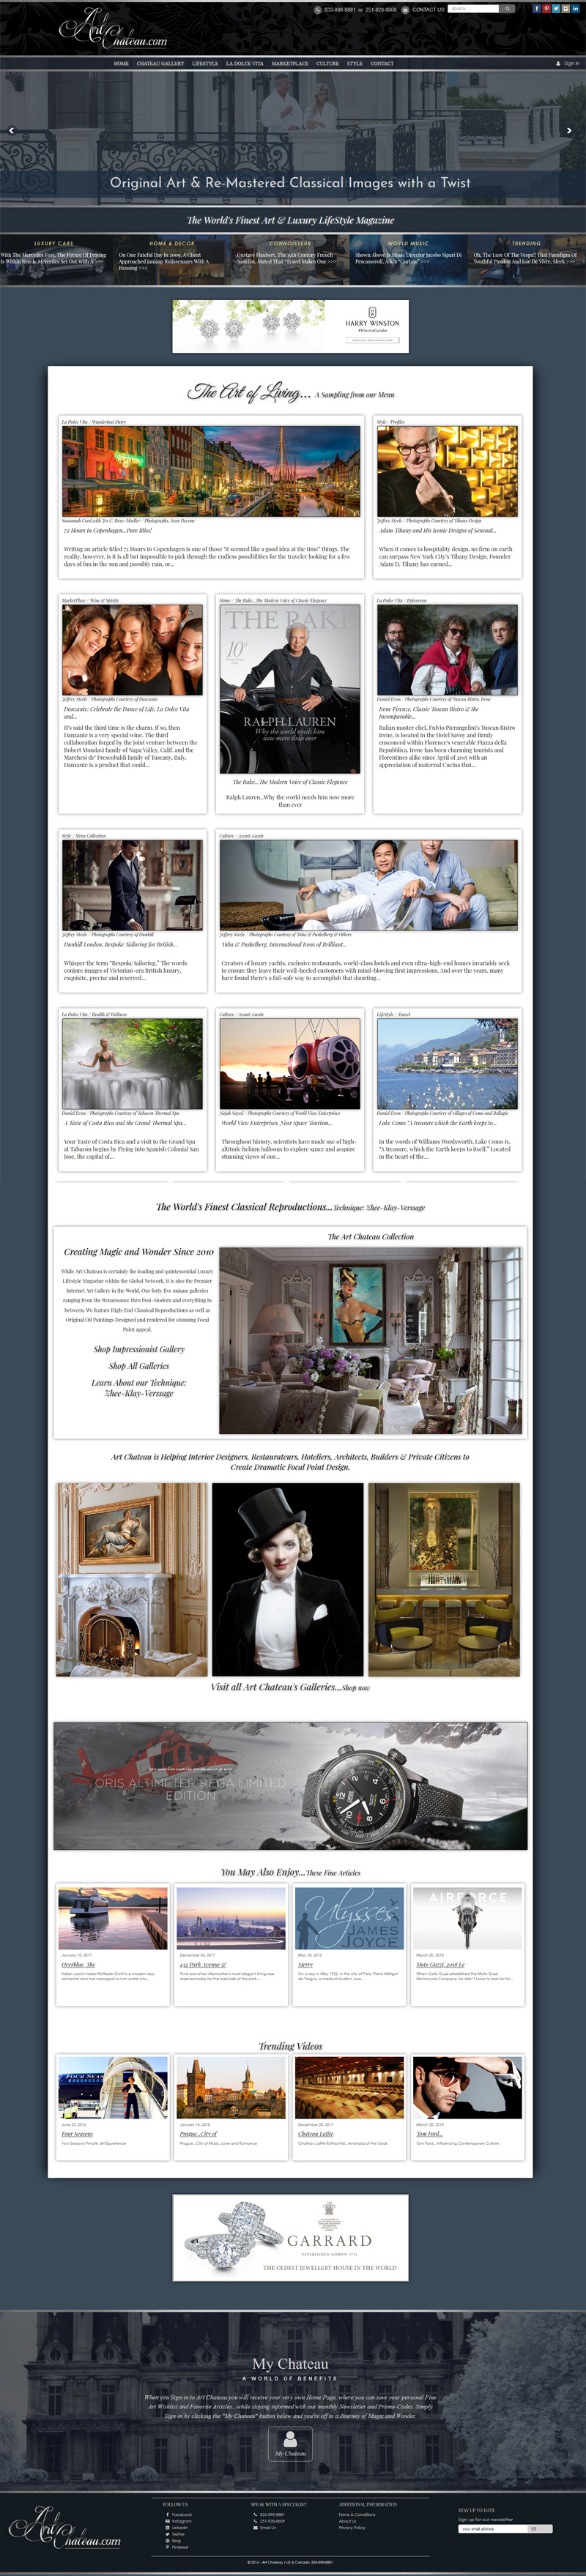 Artchateau Artchateau Magazine and E-Commerce Website